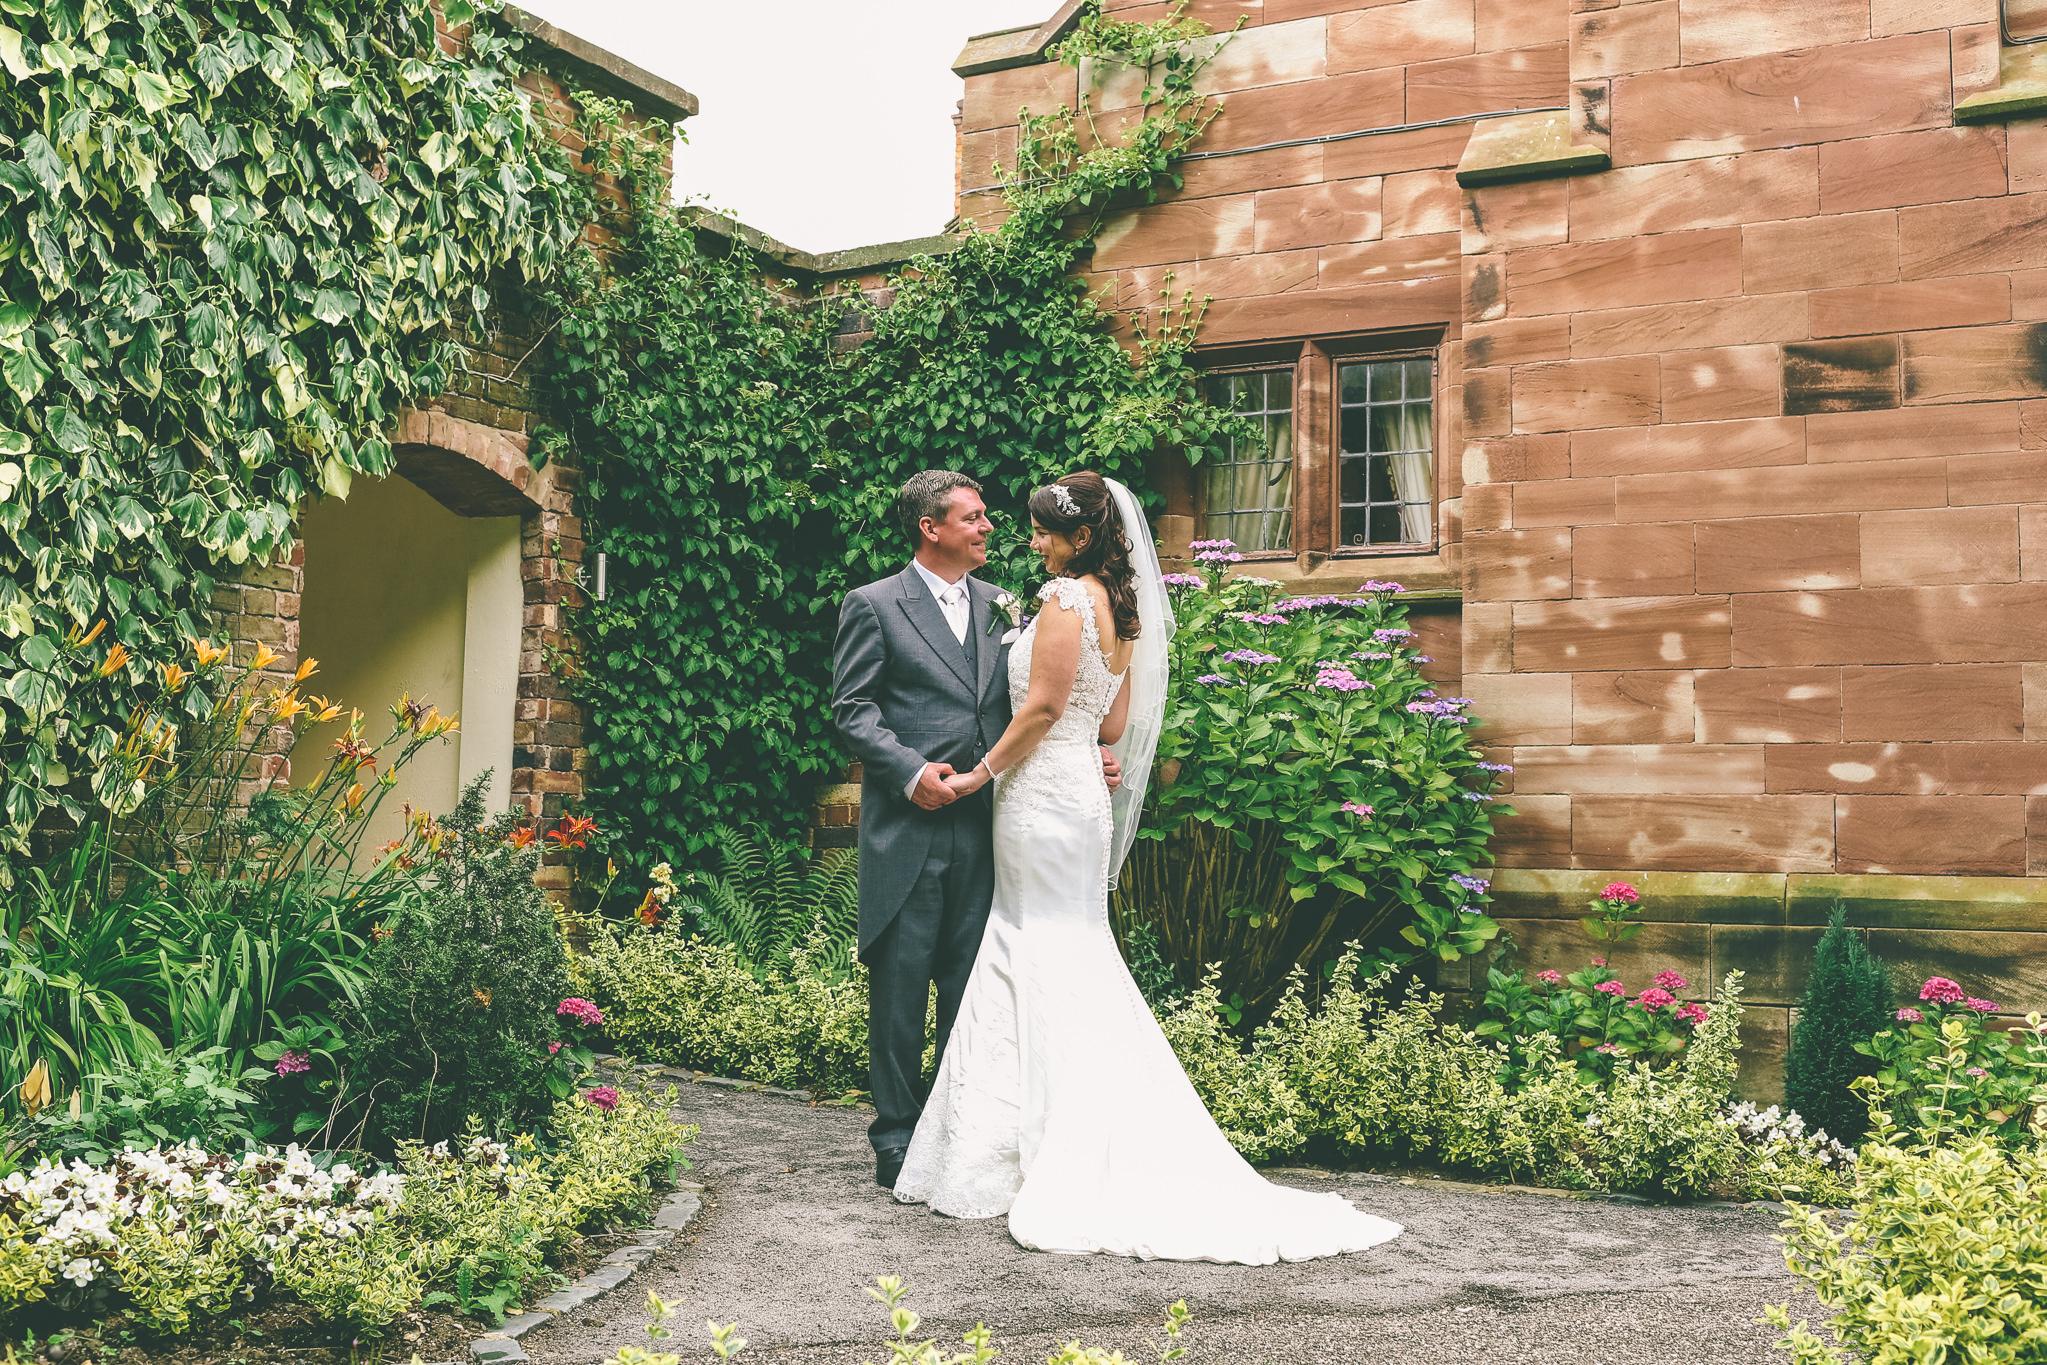 Manchester-Wedding-236.jpg